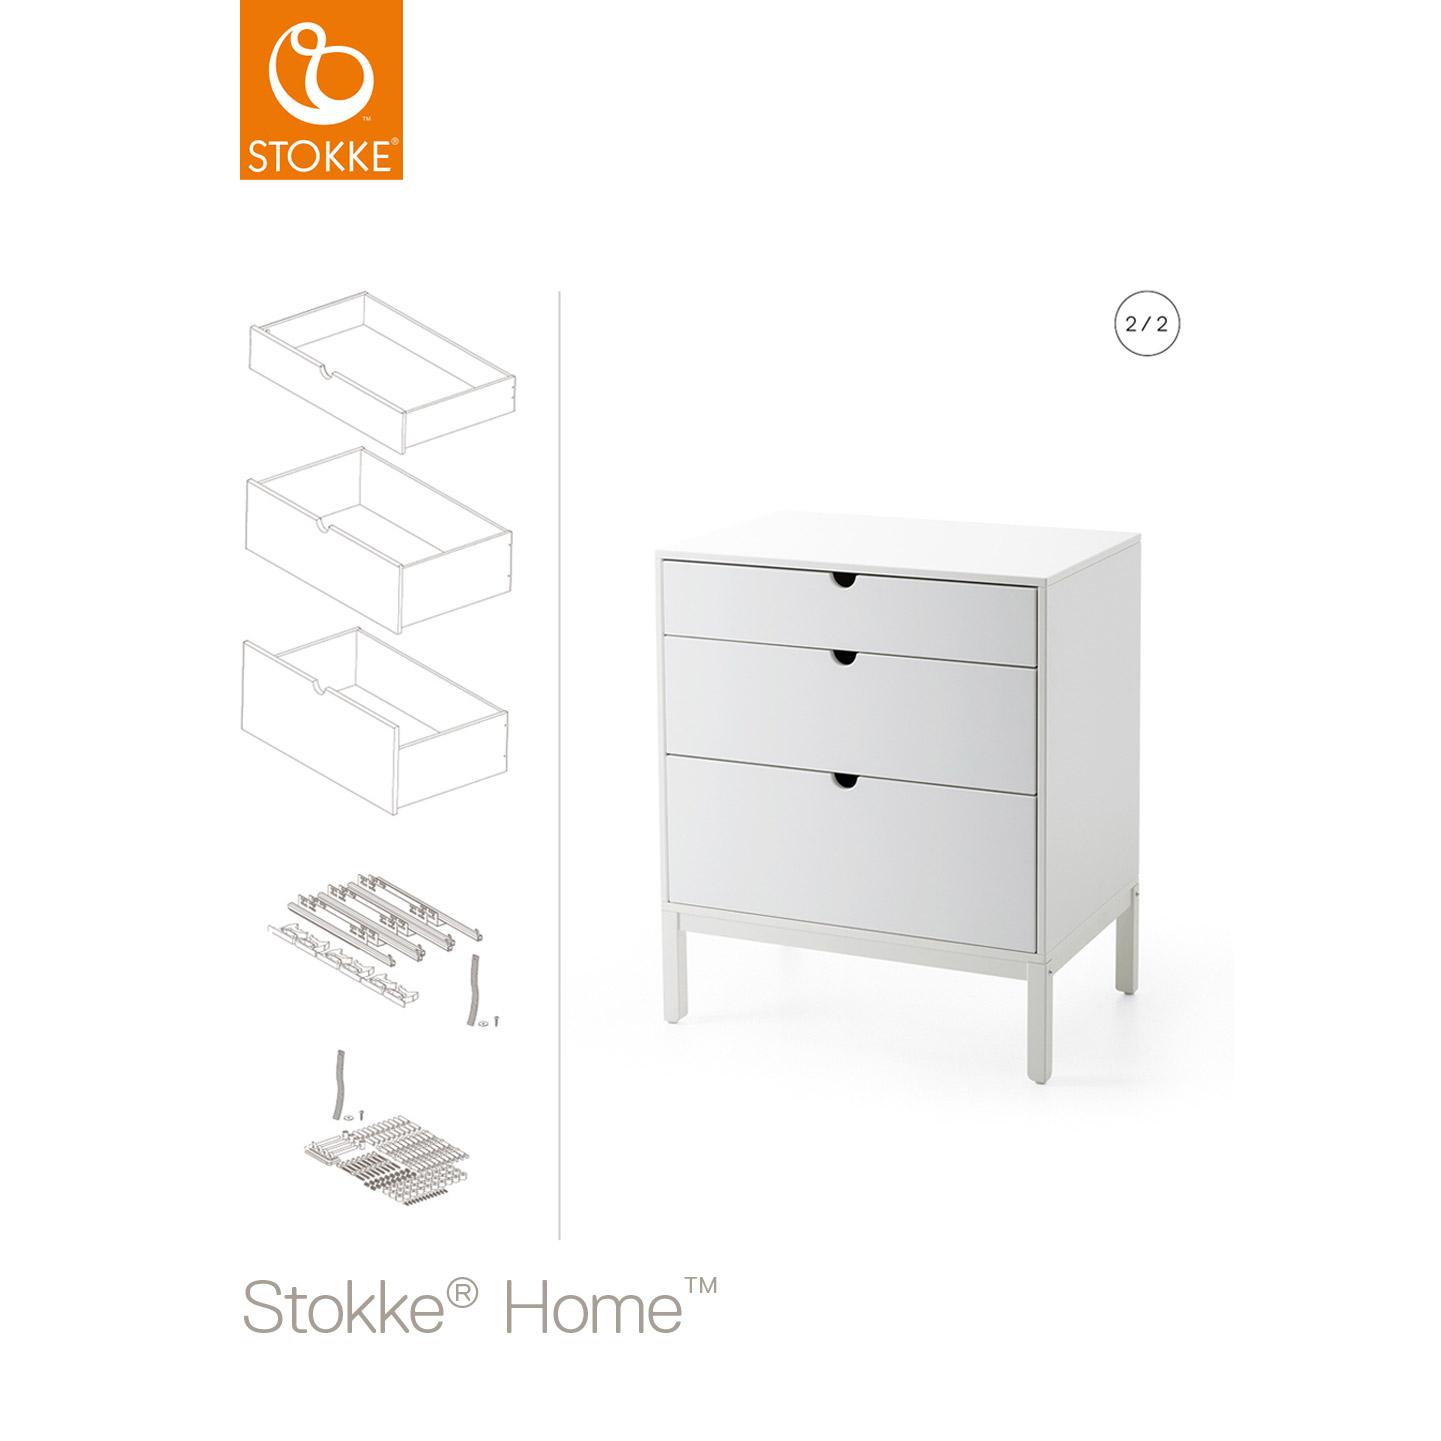 Home tiroirs commode Blanc de Stokke®, Commodes   Aubert 41e057025ac